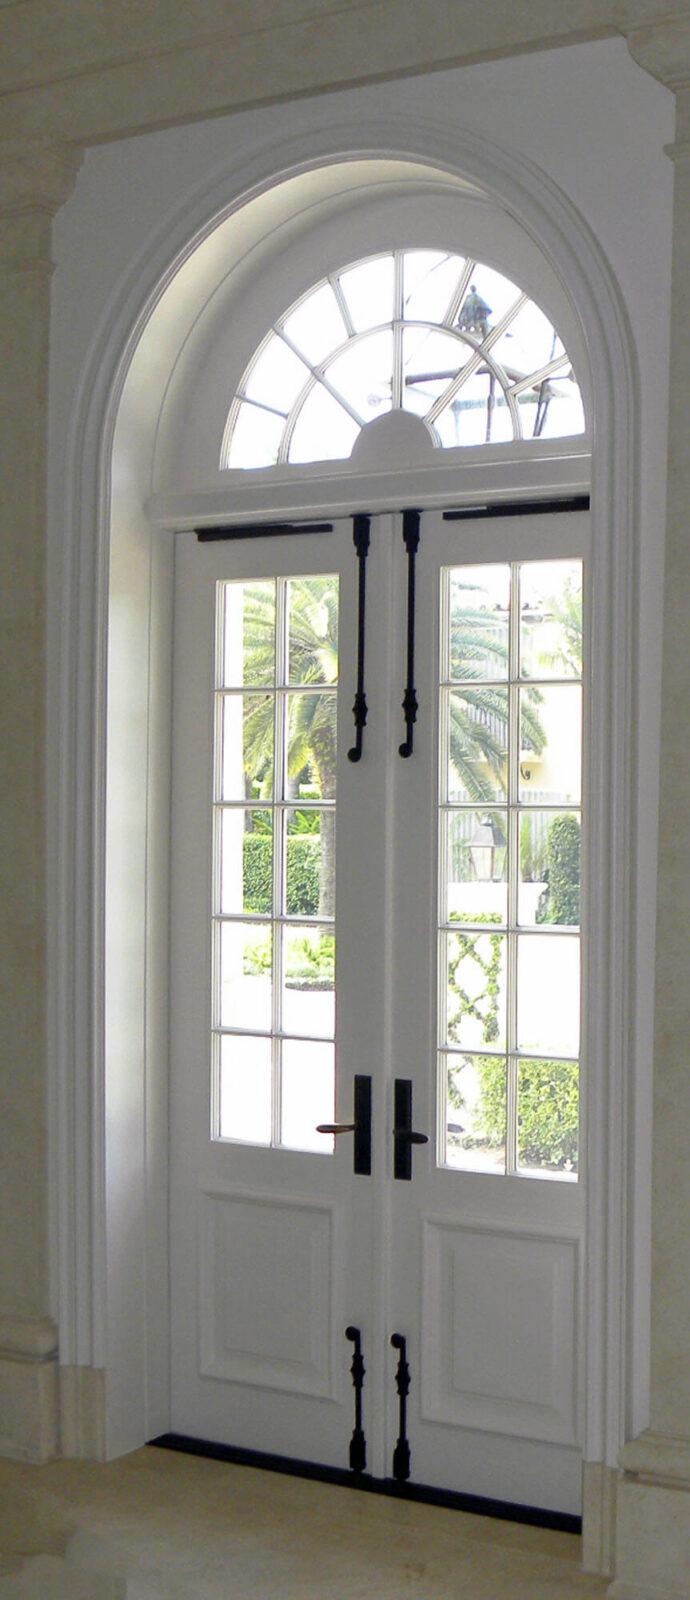 EL VENADO MAHOGANY DOORS INTERIOR